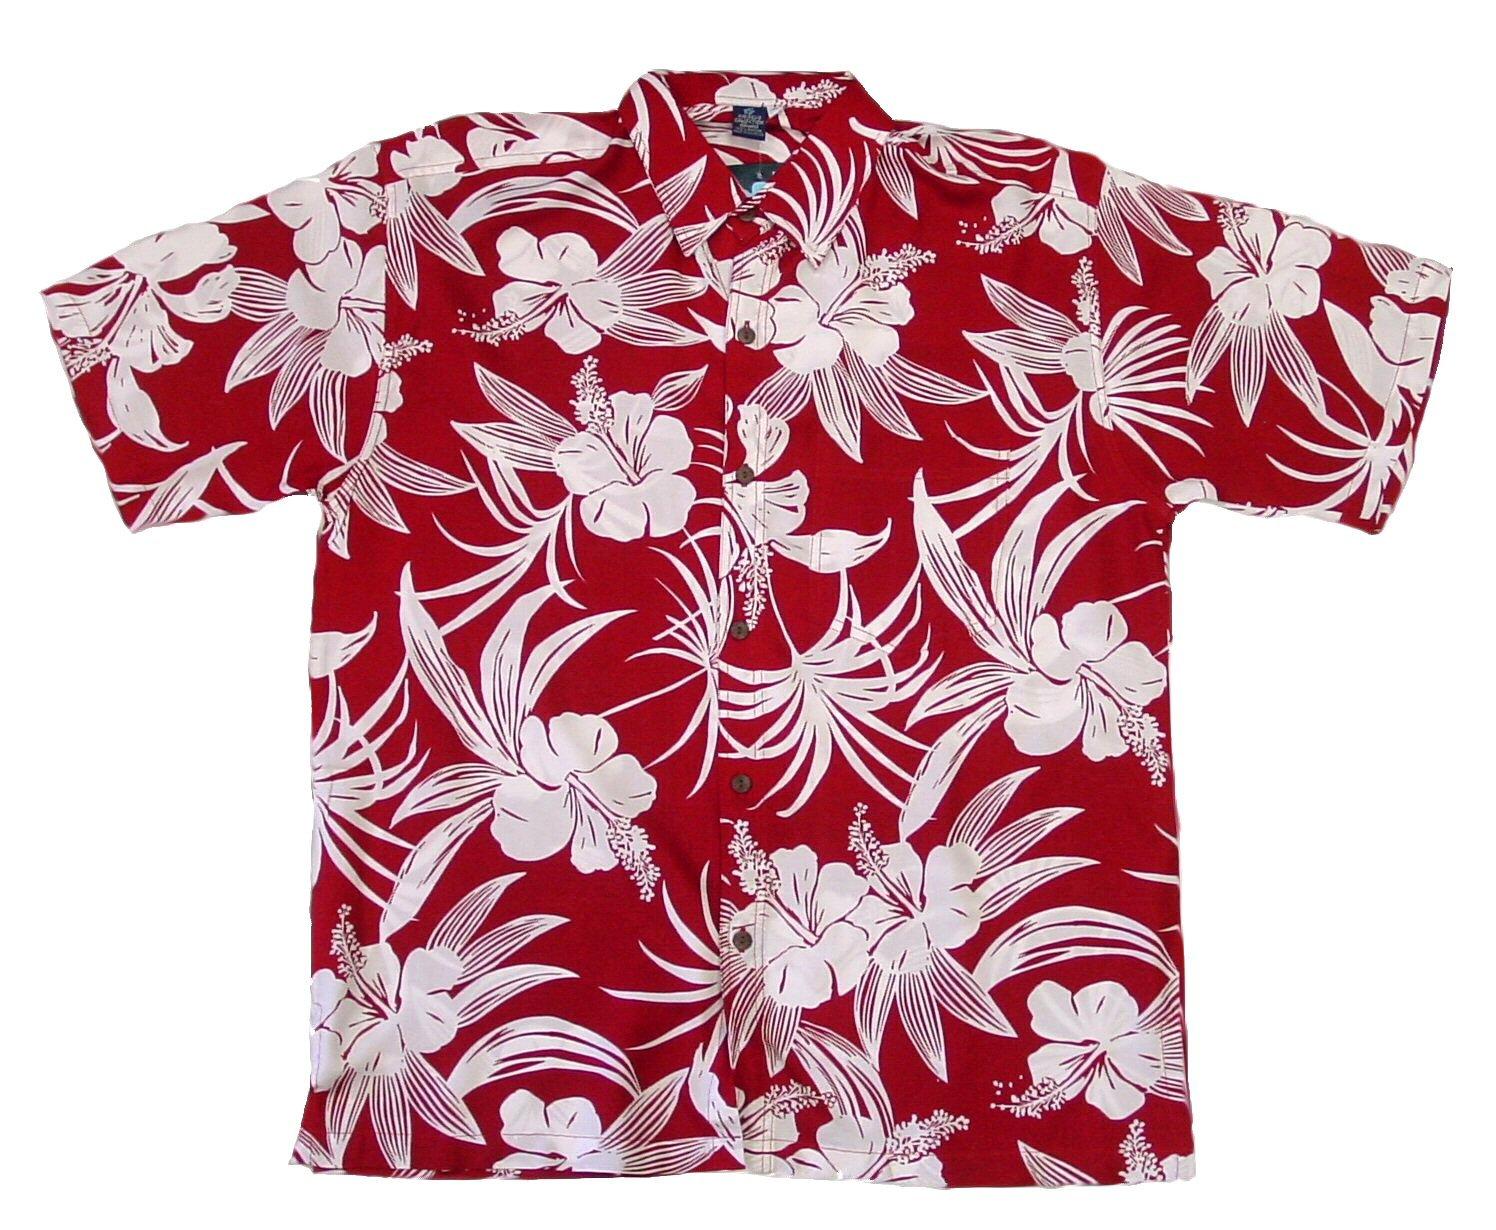 Hawaiian shirts in chadstone melbourne for The hawaiian shirt company